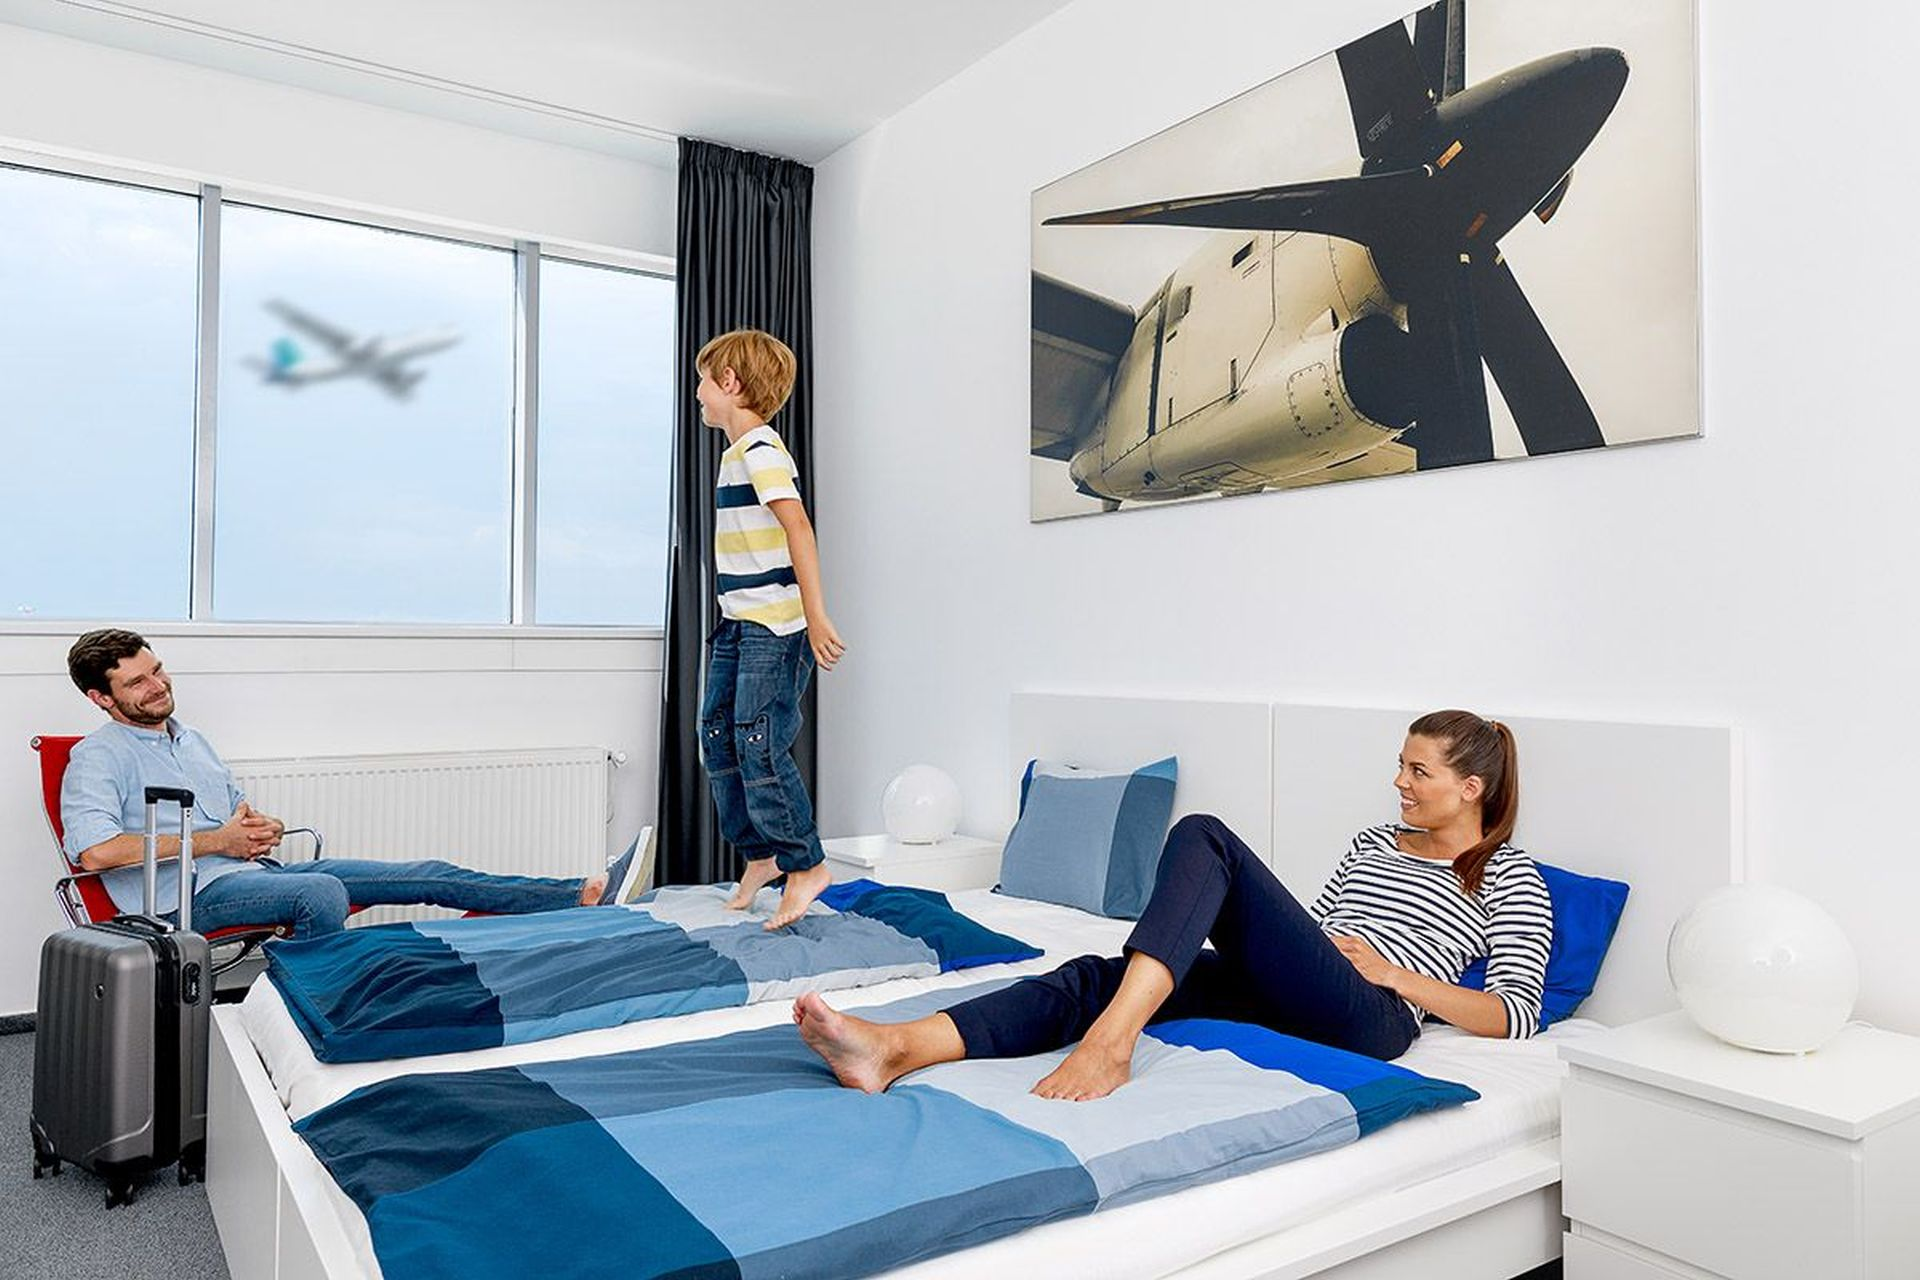 Pokoj hotelu AeroRooms na Letišti Praha. Foto: Letiště Praha